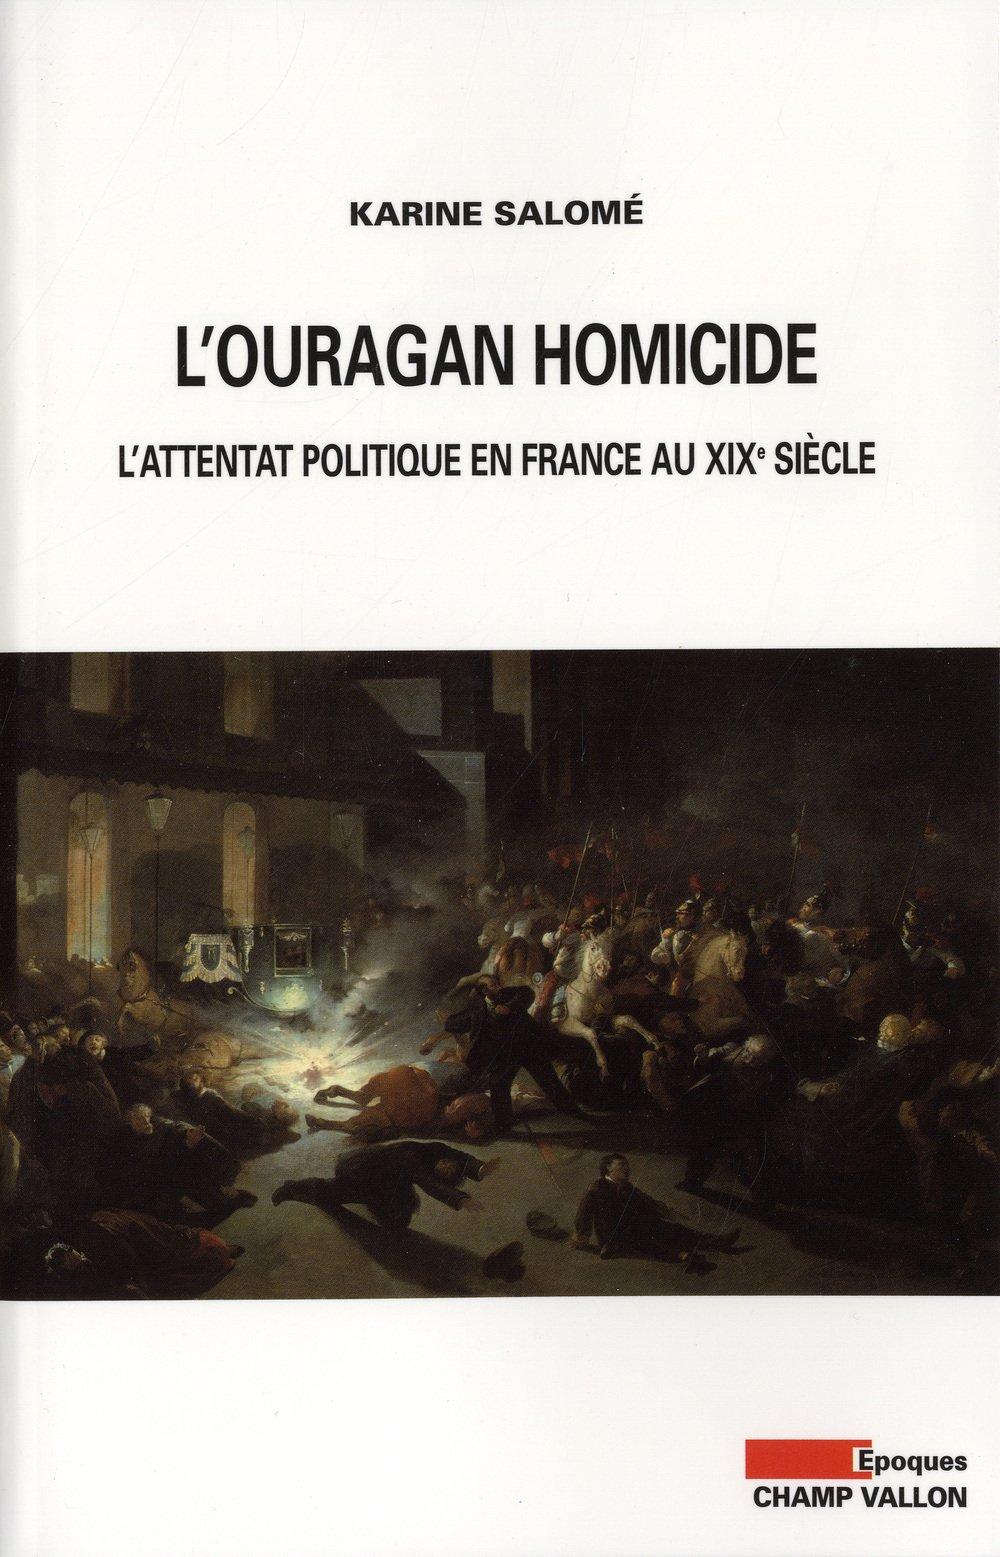 L'ouragan homicide : L'attentat politique en France au XIXe siècle.